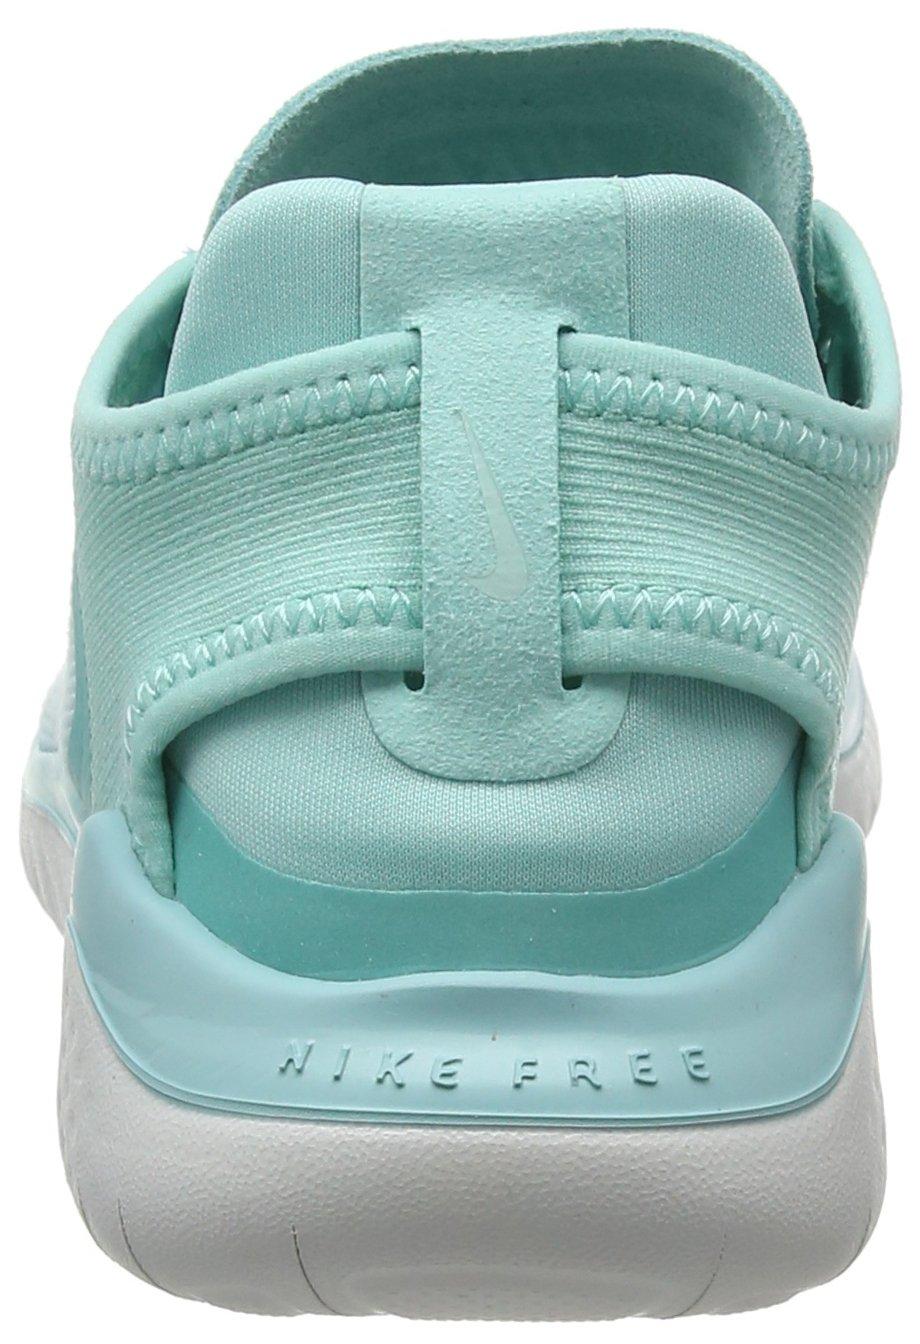 28b27cd037558 Amazon.com  Nike Free Rn 2018 Sun Sz 9 Womens Running Island Green Igloo- Vast Grey Shoes  Nike  Sports   Outdoors